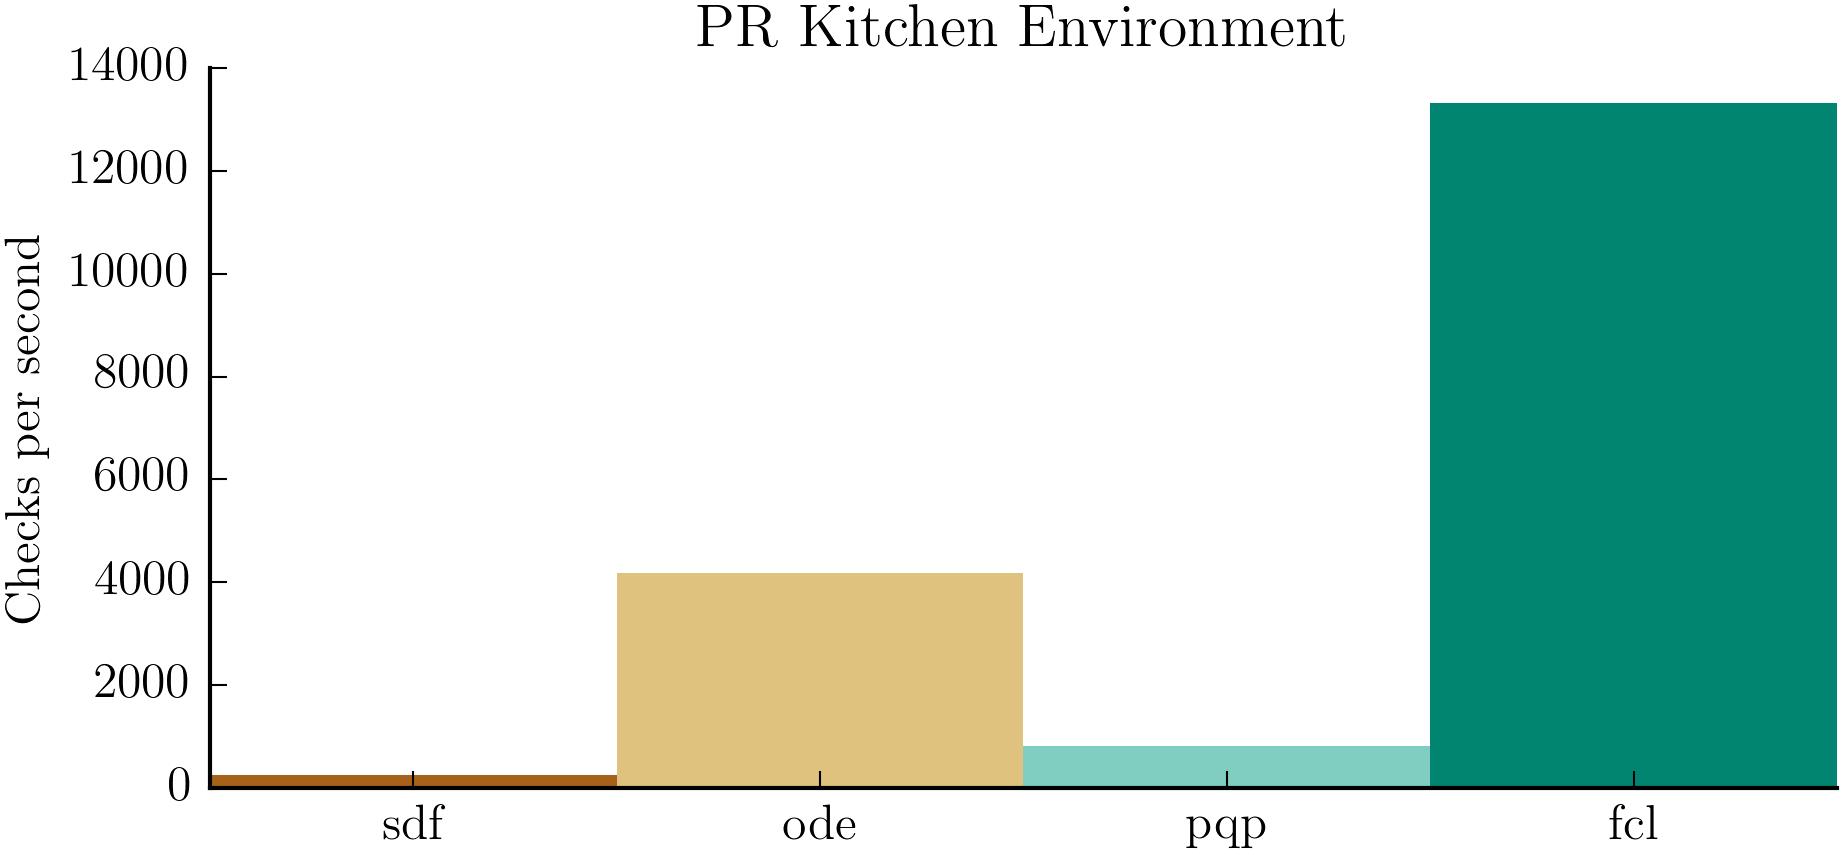 prkitchen_env_results